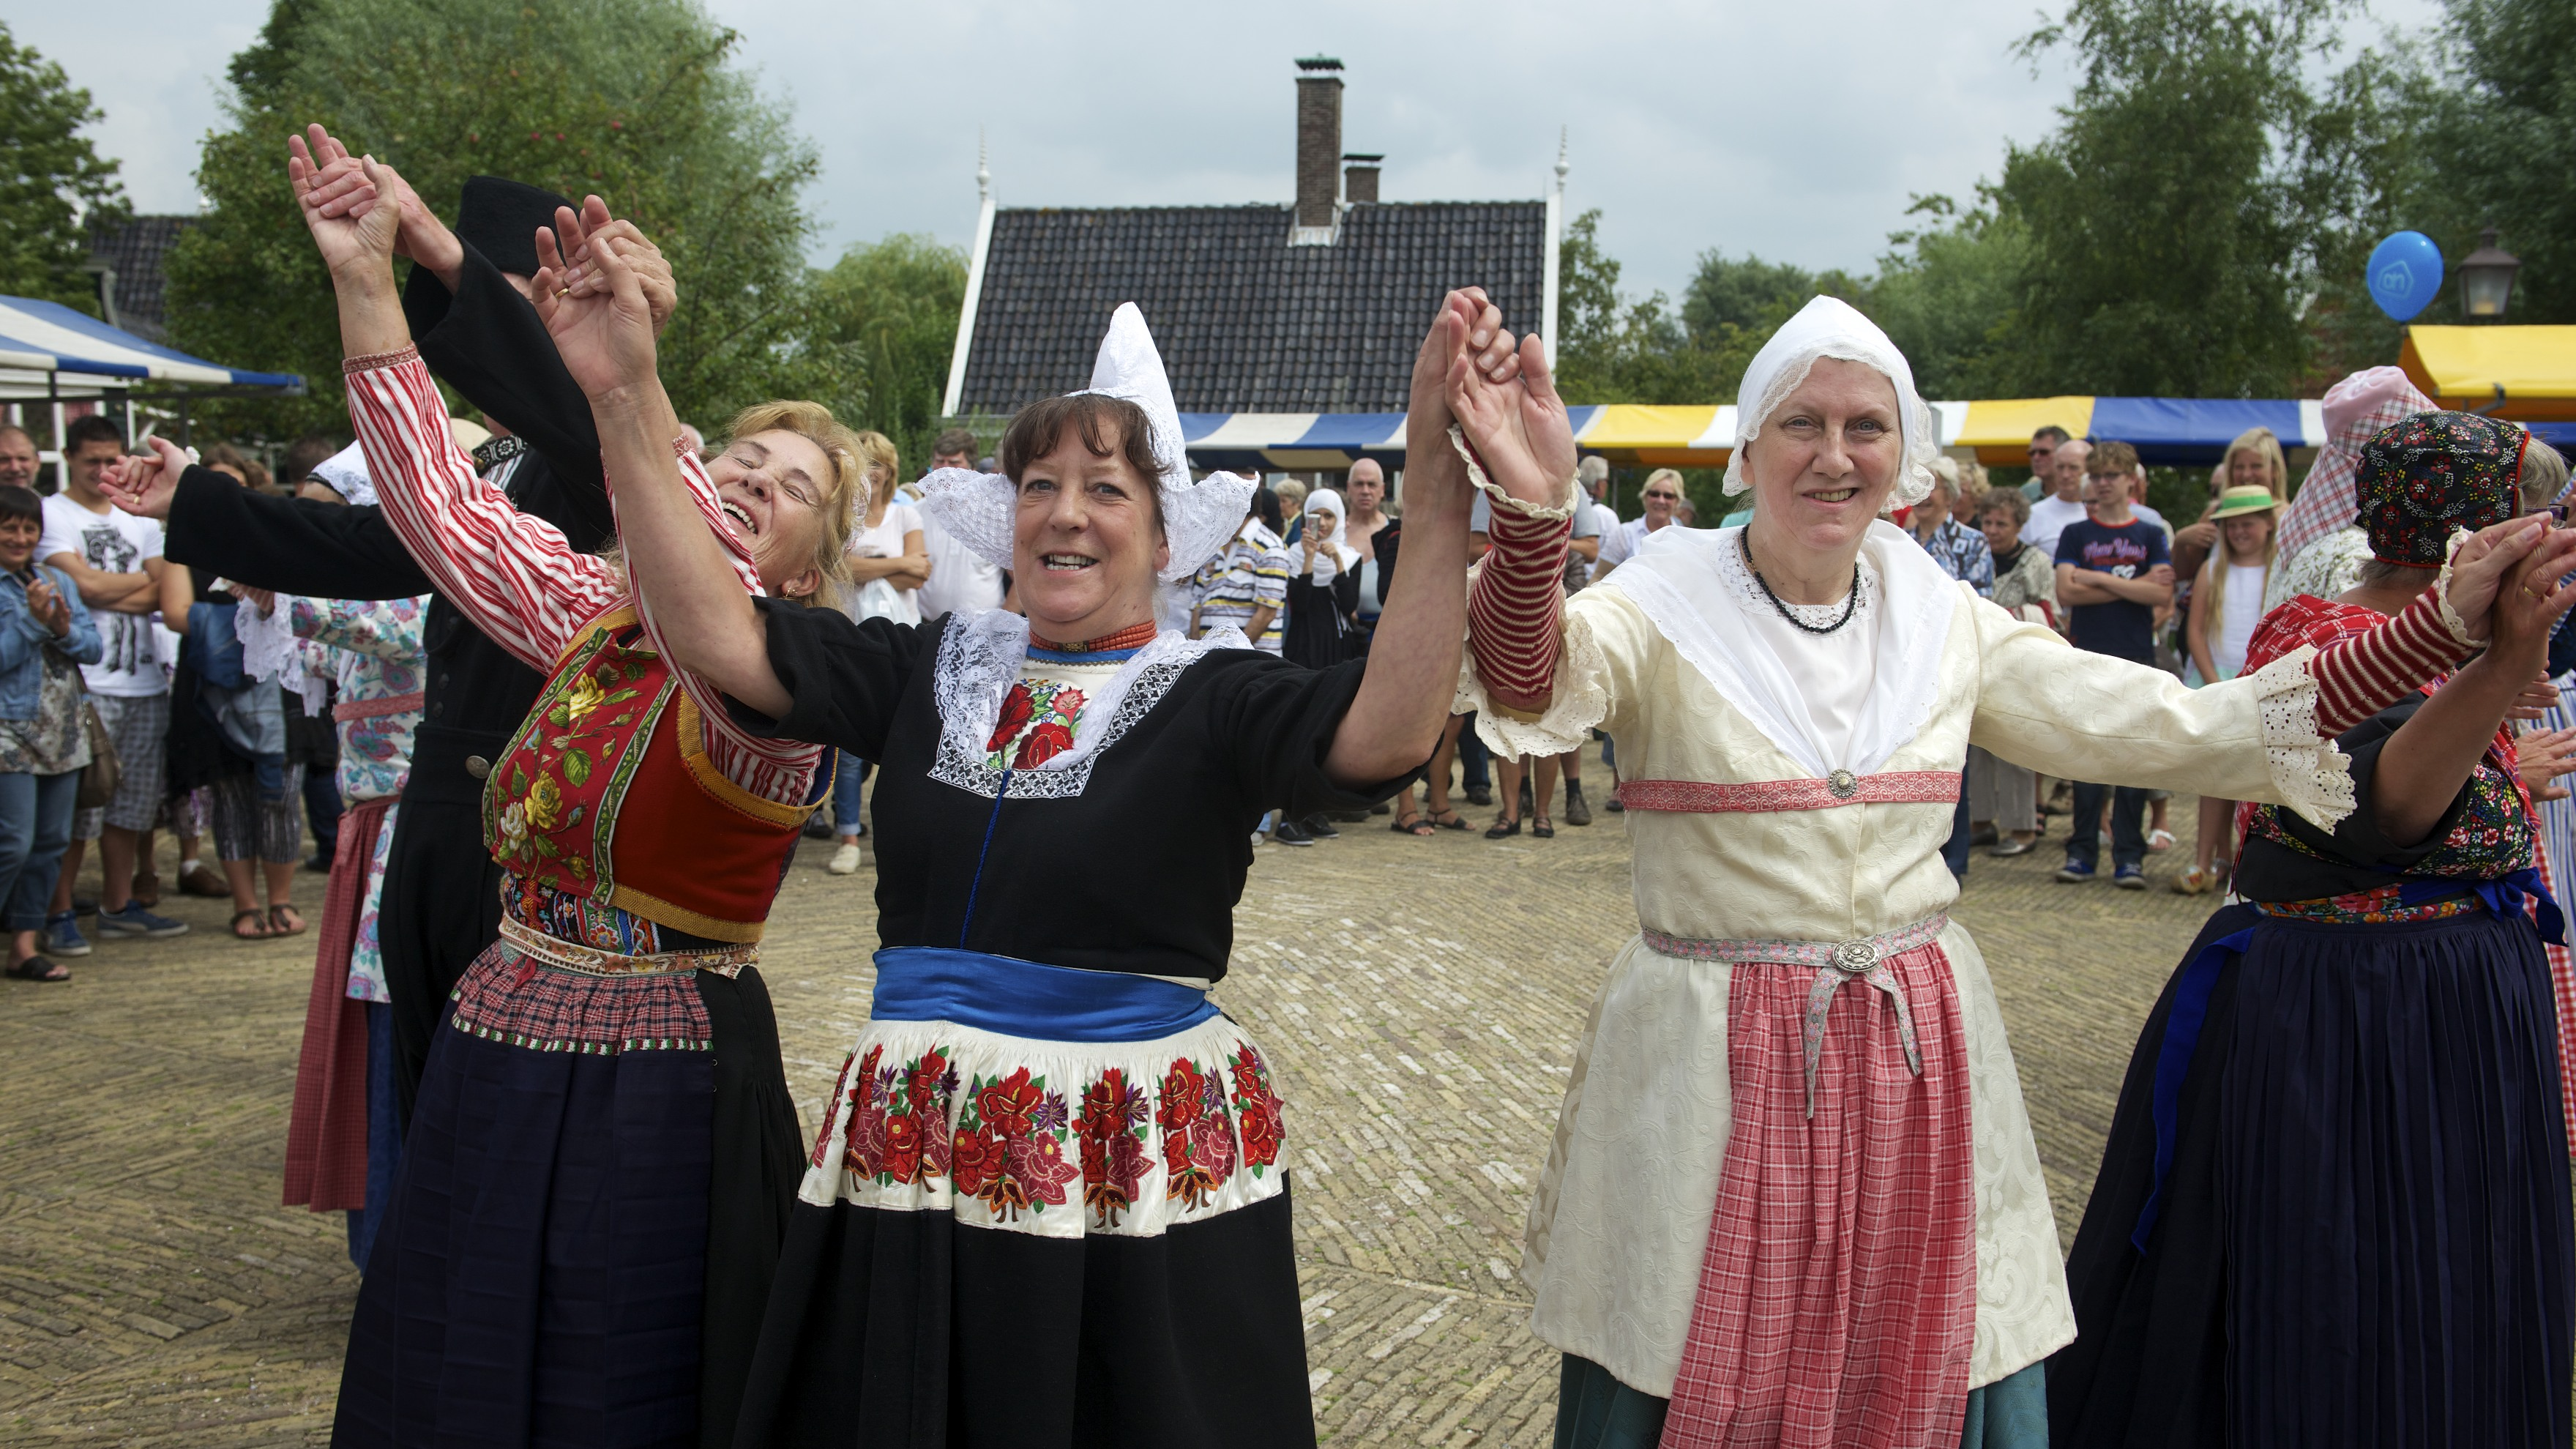 Folkloredag 20 augustus   de zaanse schans